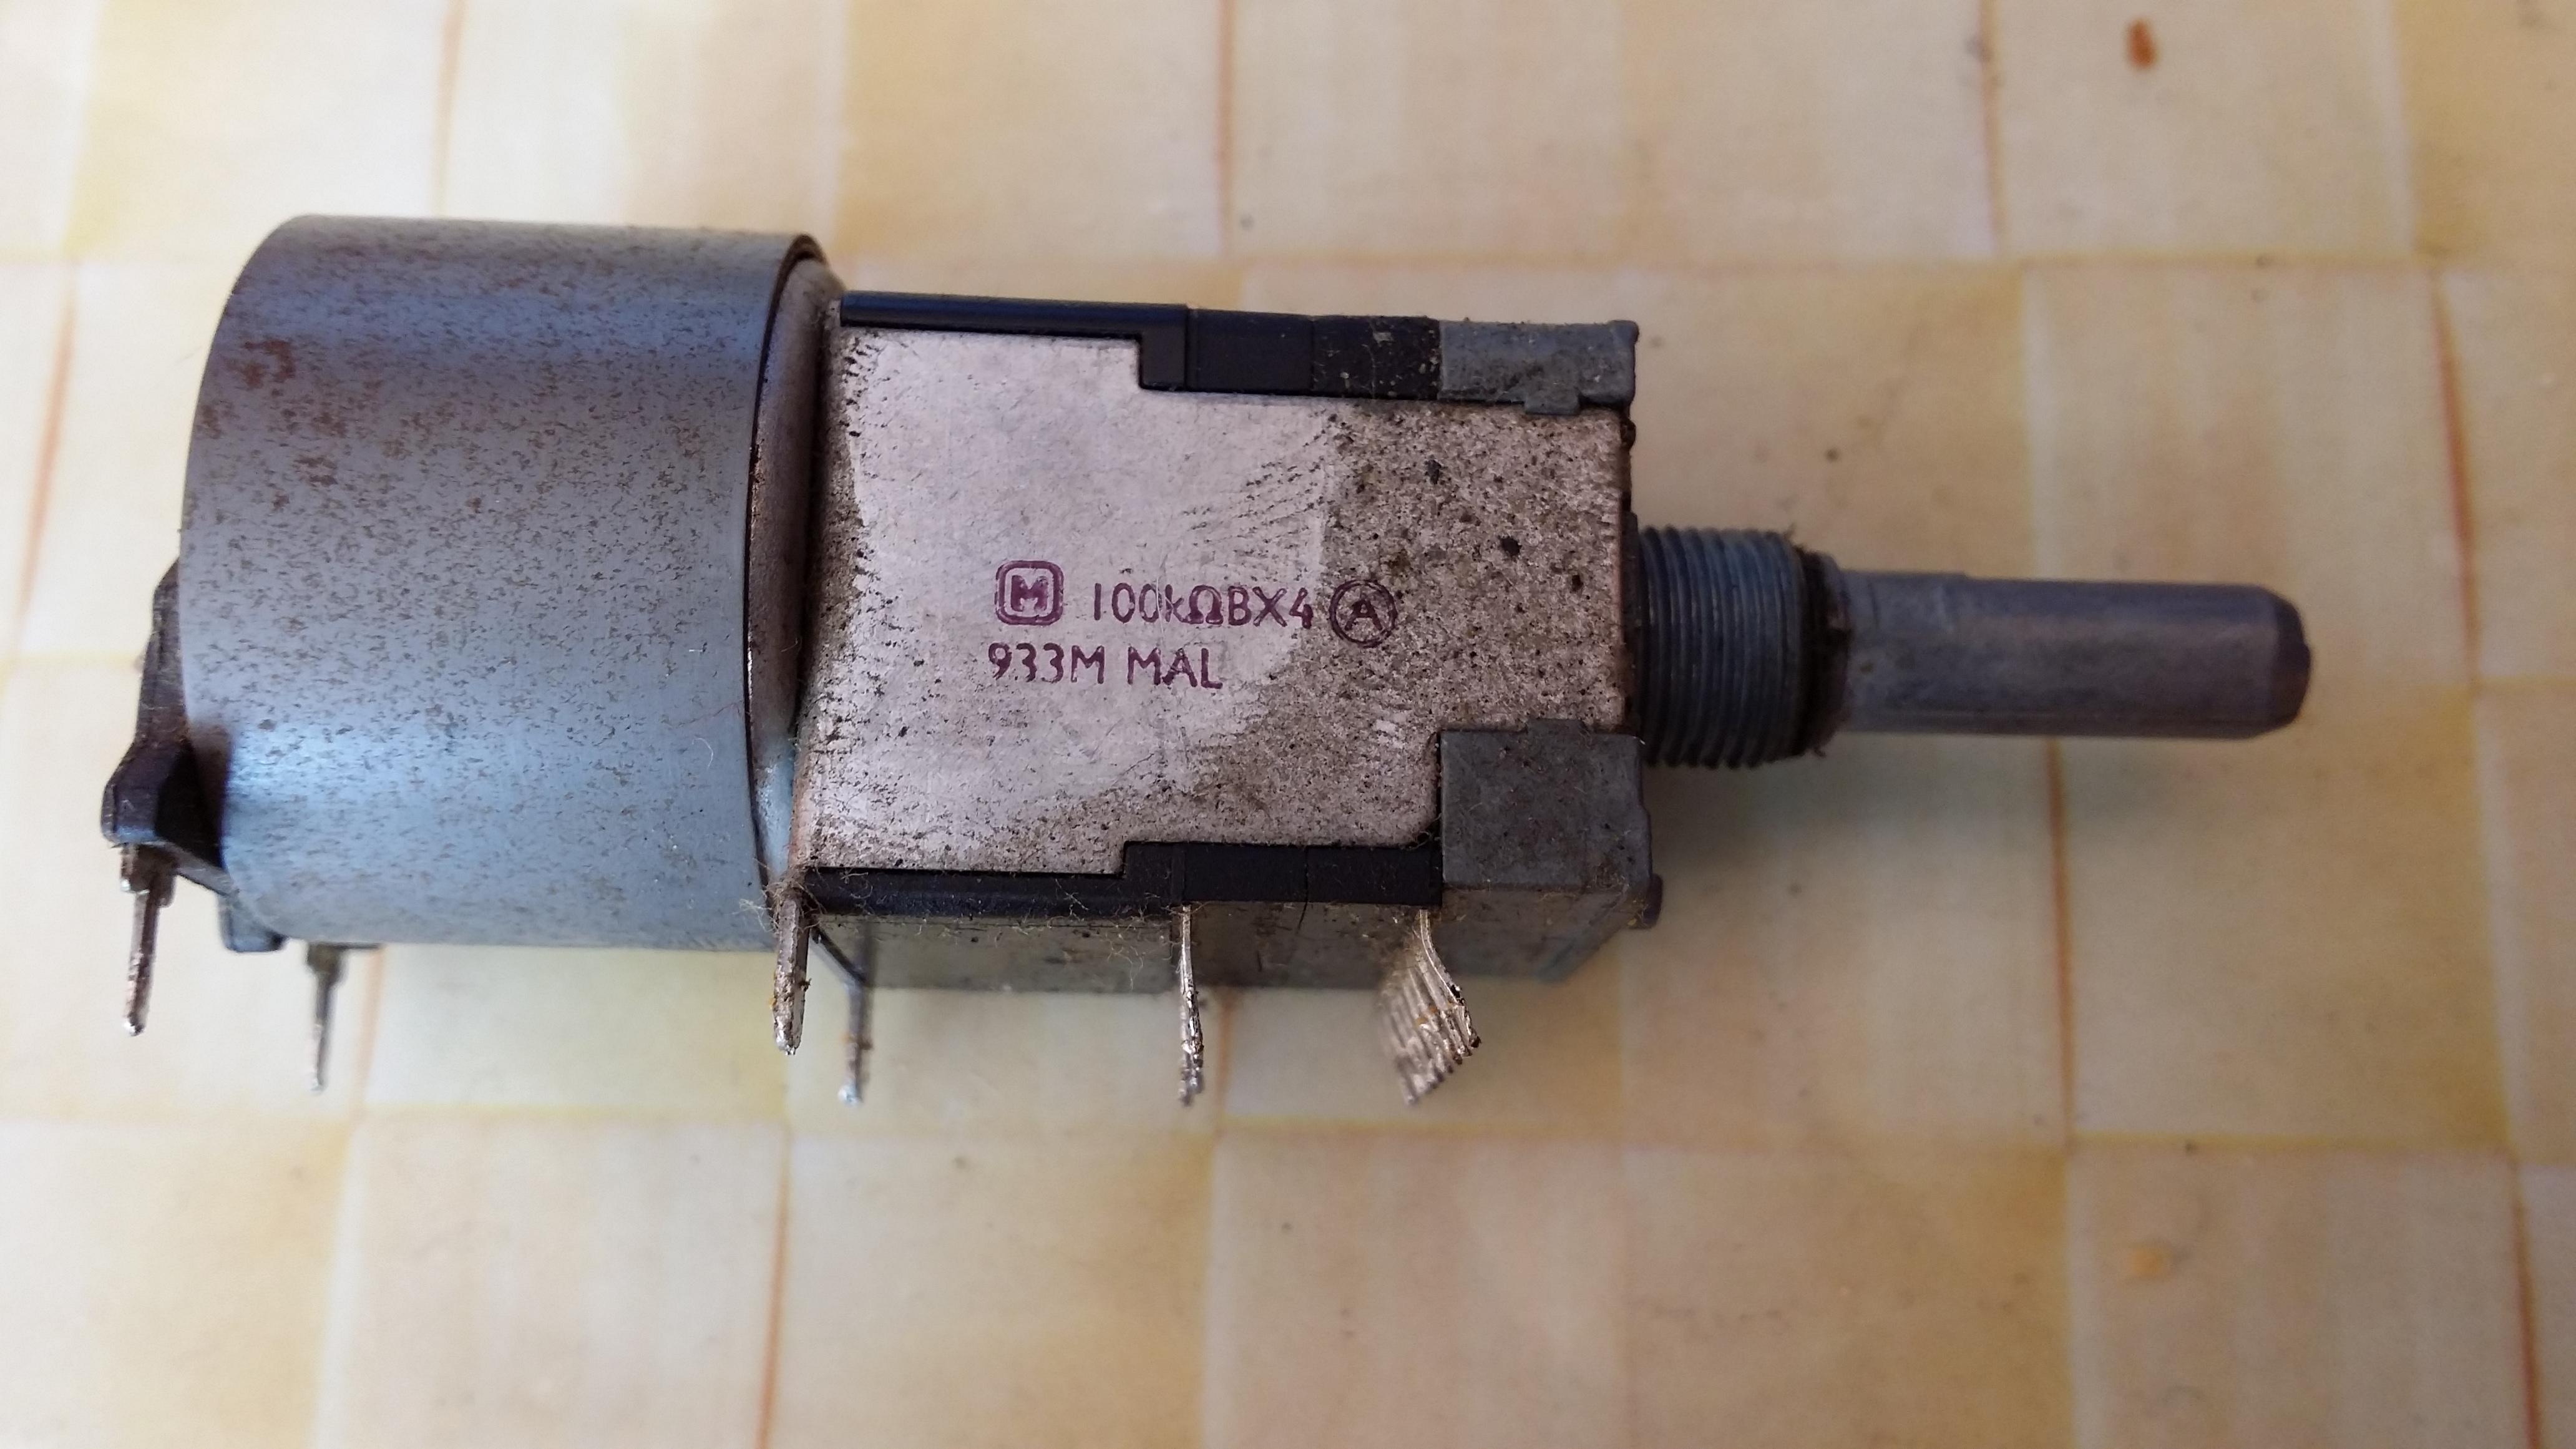 [Kupi�] Potencjometr do amplitunera Technics SA-EX320 (4x100k)